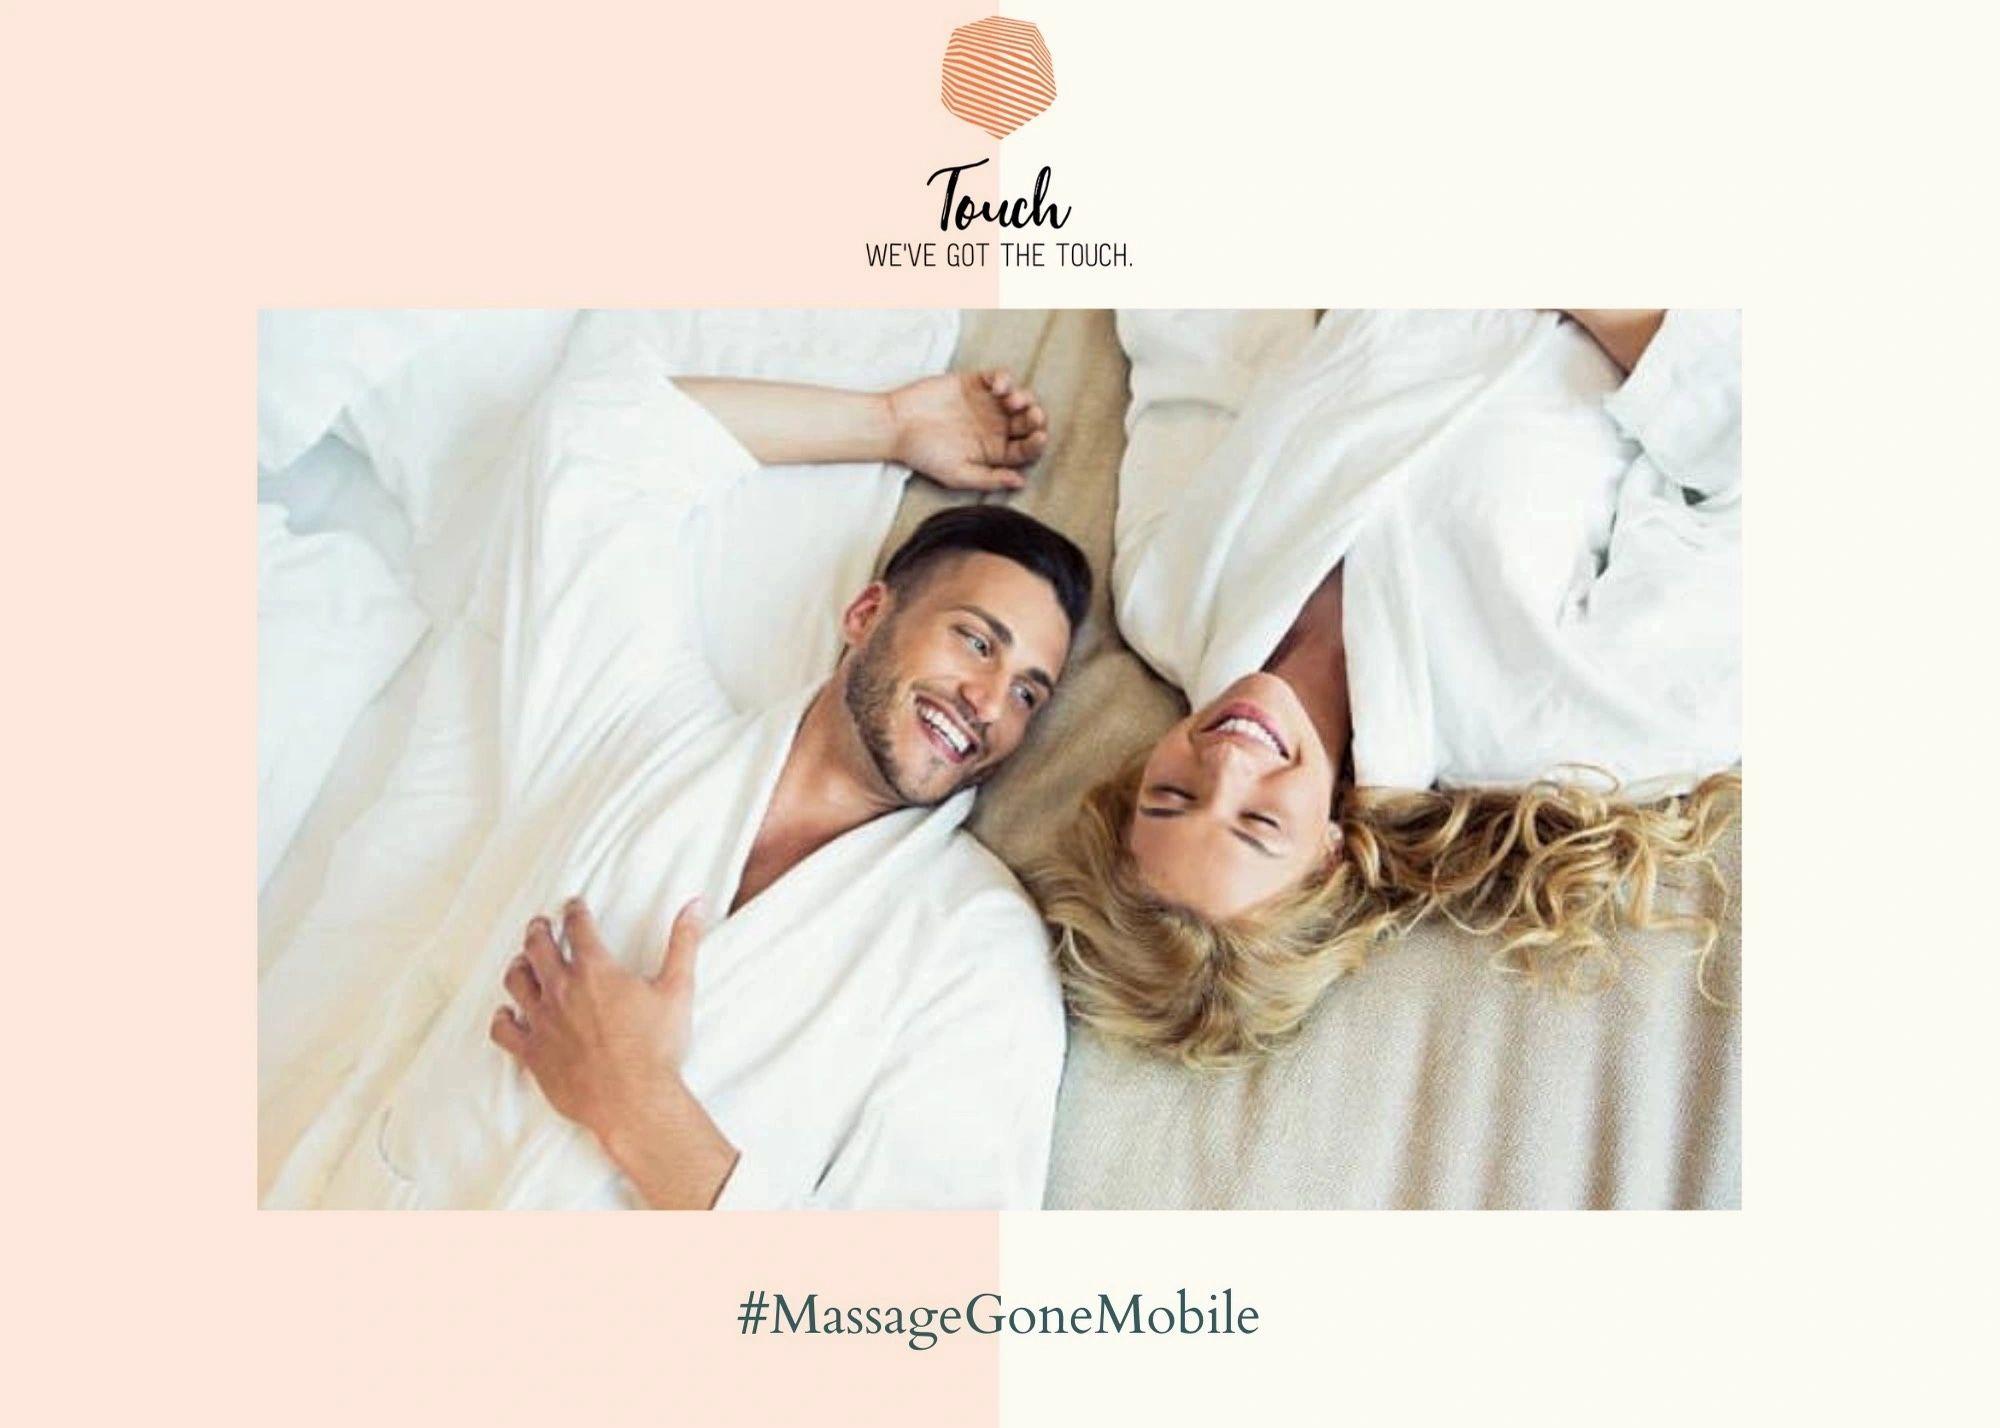 Touch Massage logo